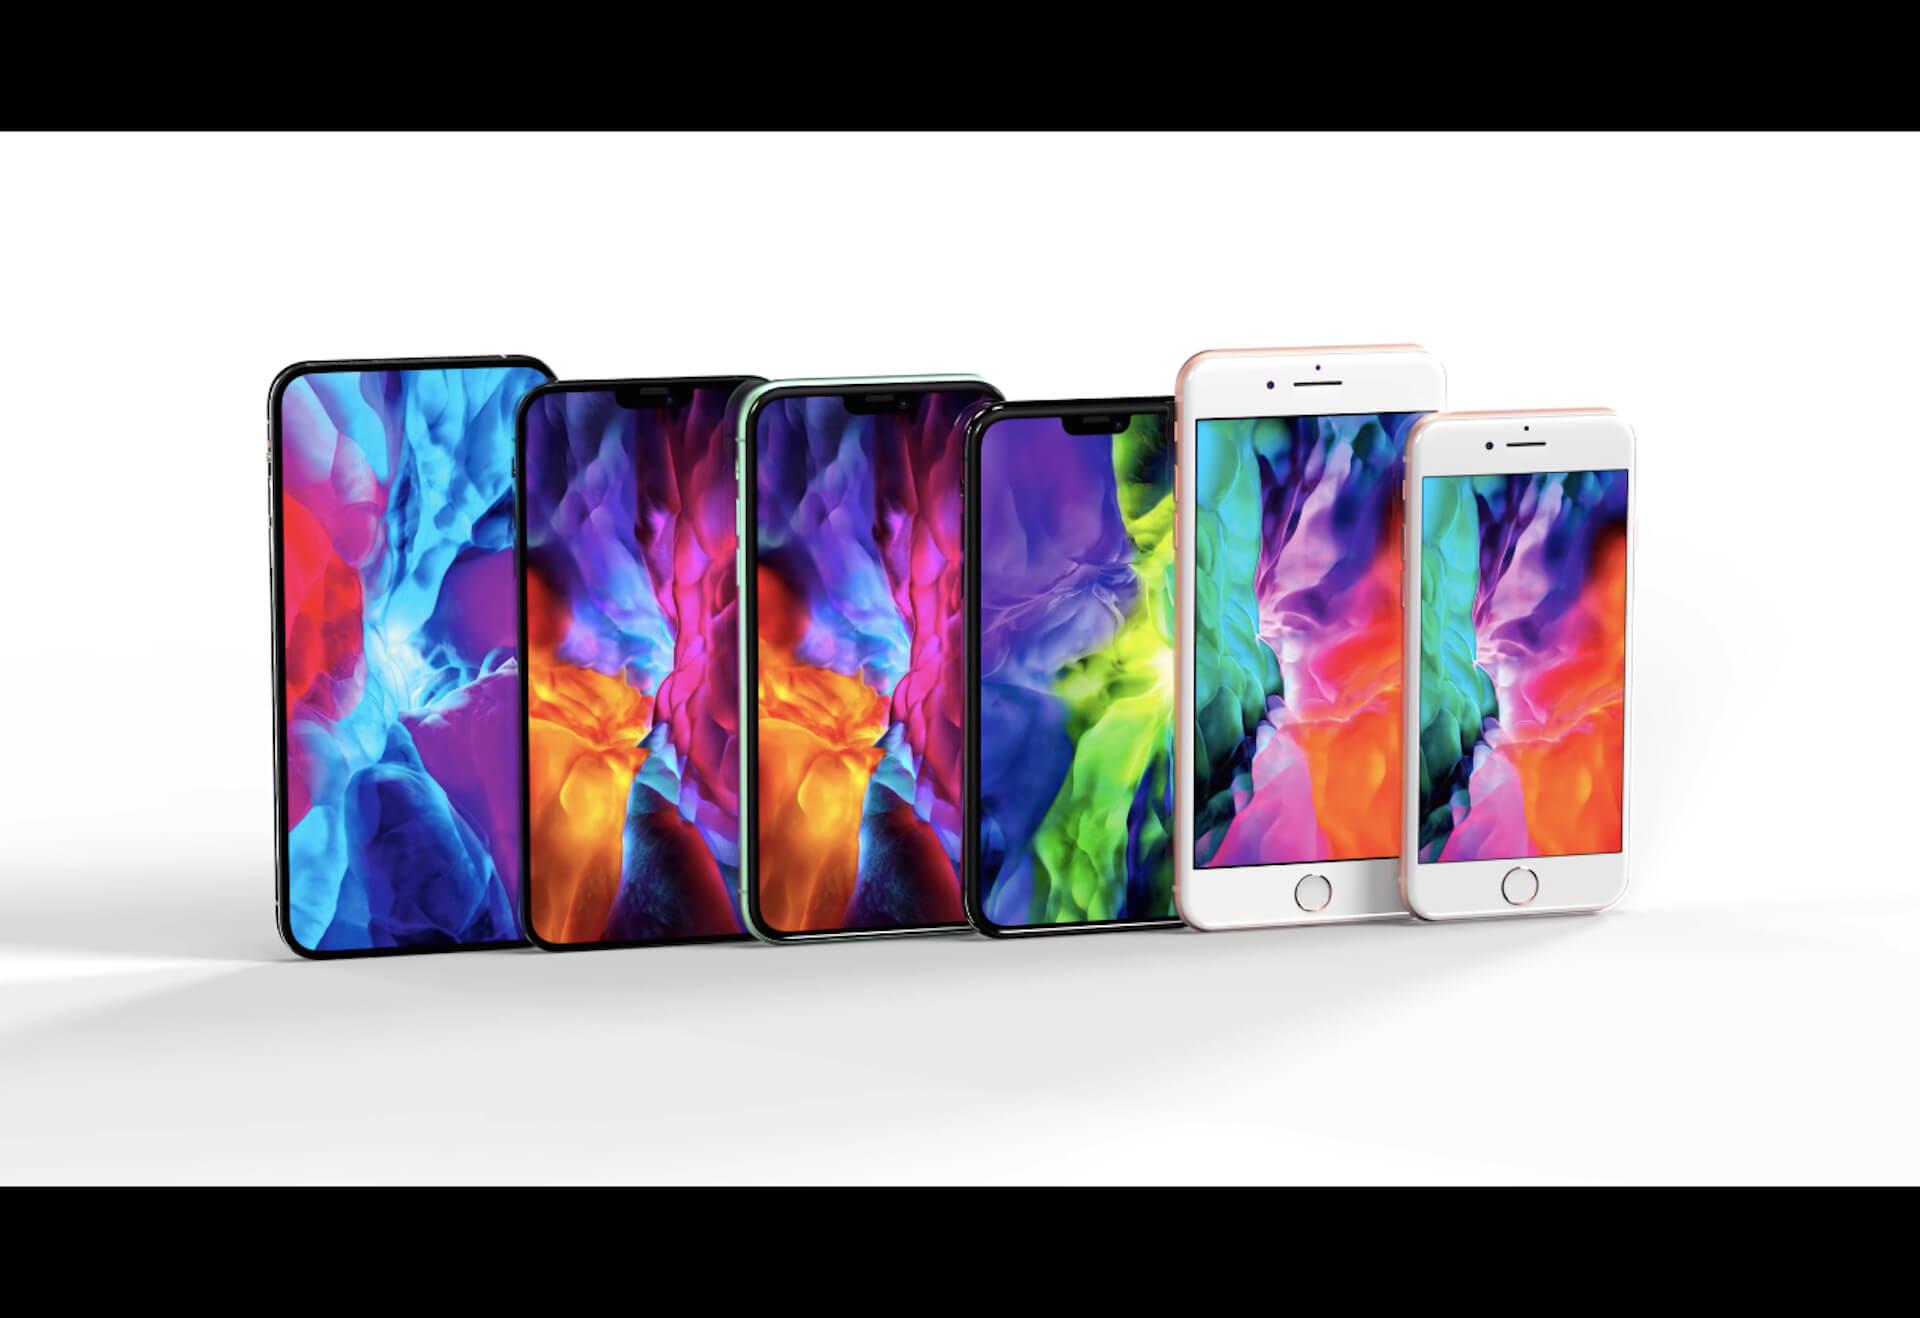 iPhone 12シリーズの全サイズのモックアップと歴代iPhoneをサイズ比較した画像が公開! tech200708_iphone12_mockup_main